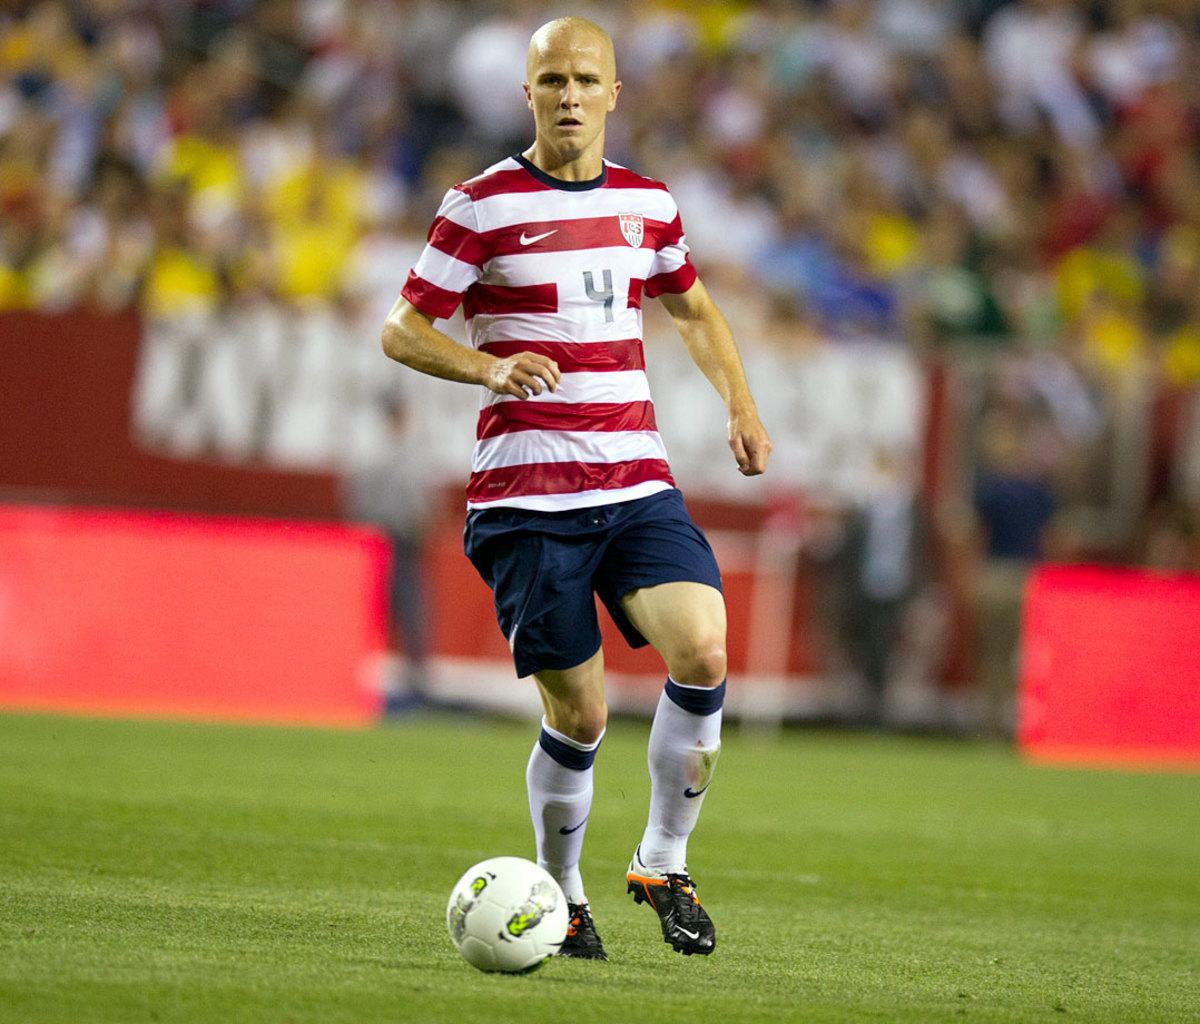 2012-USA-home-uniform-Michael-Bradley-opx9-105976.jpg